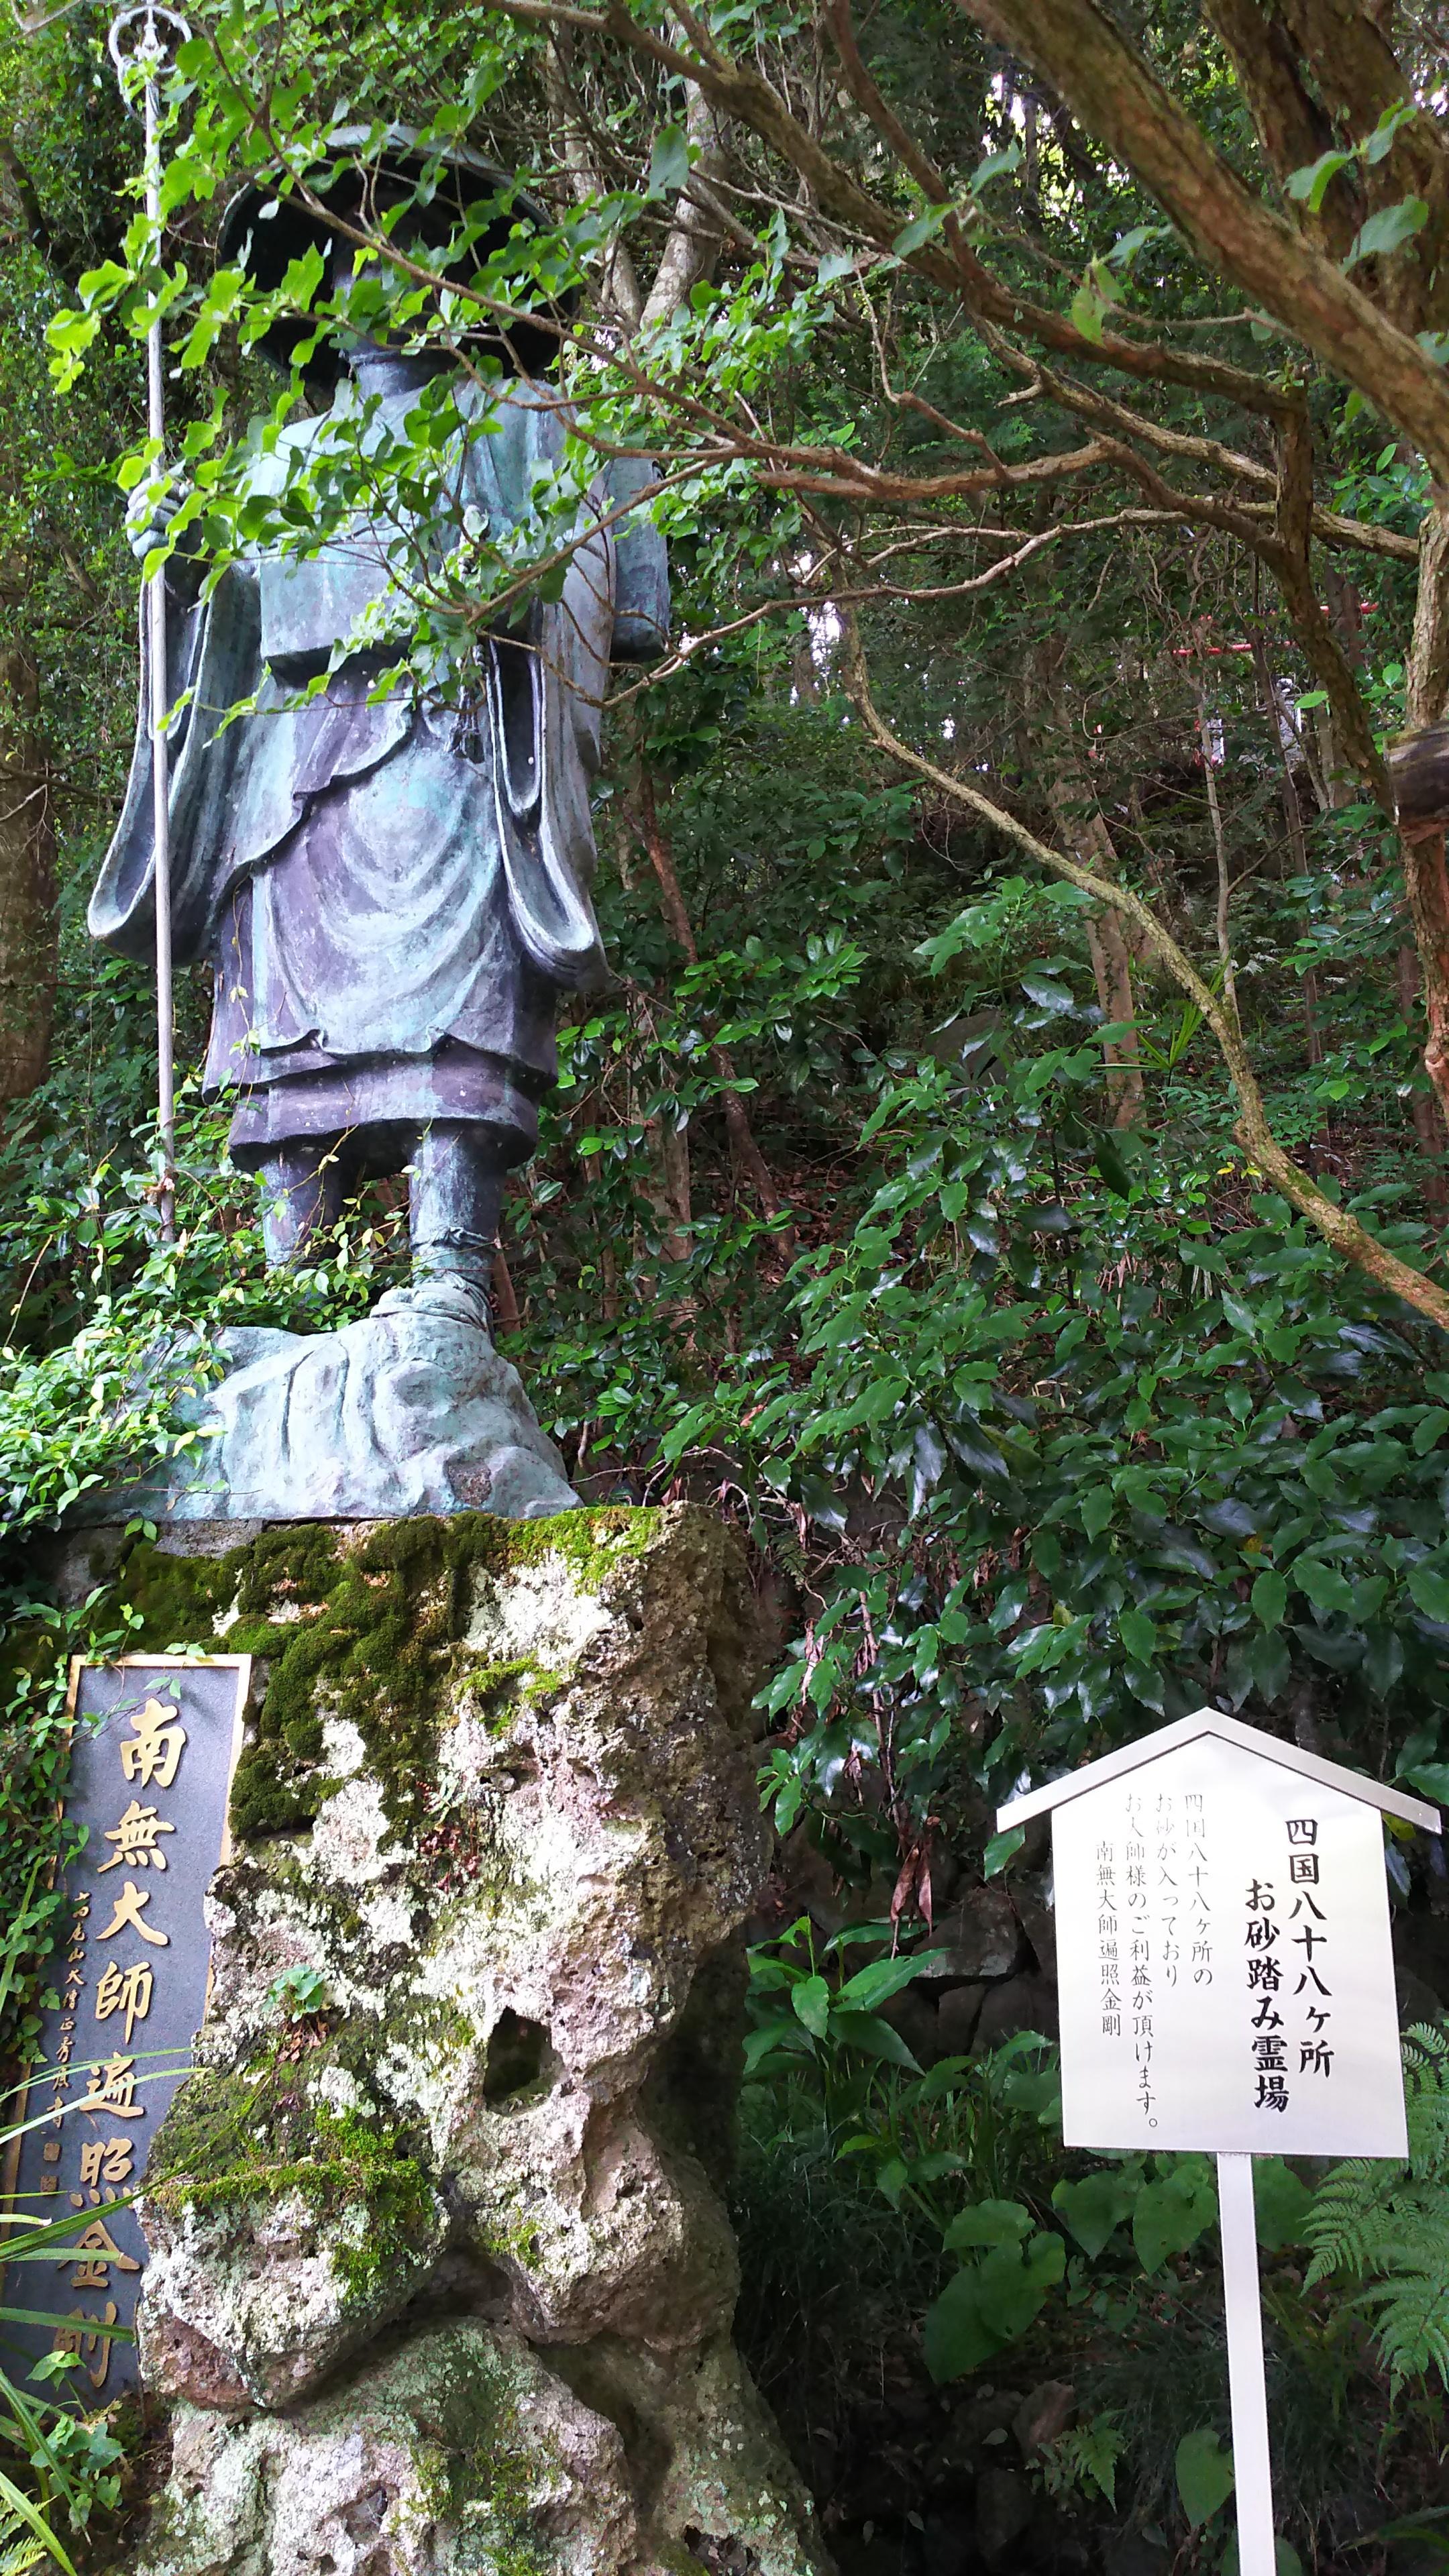 持寳院(多気不動尊)の像